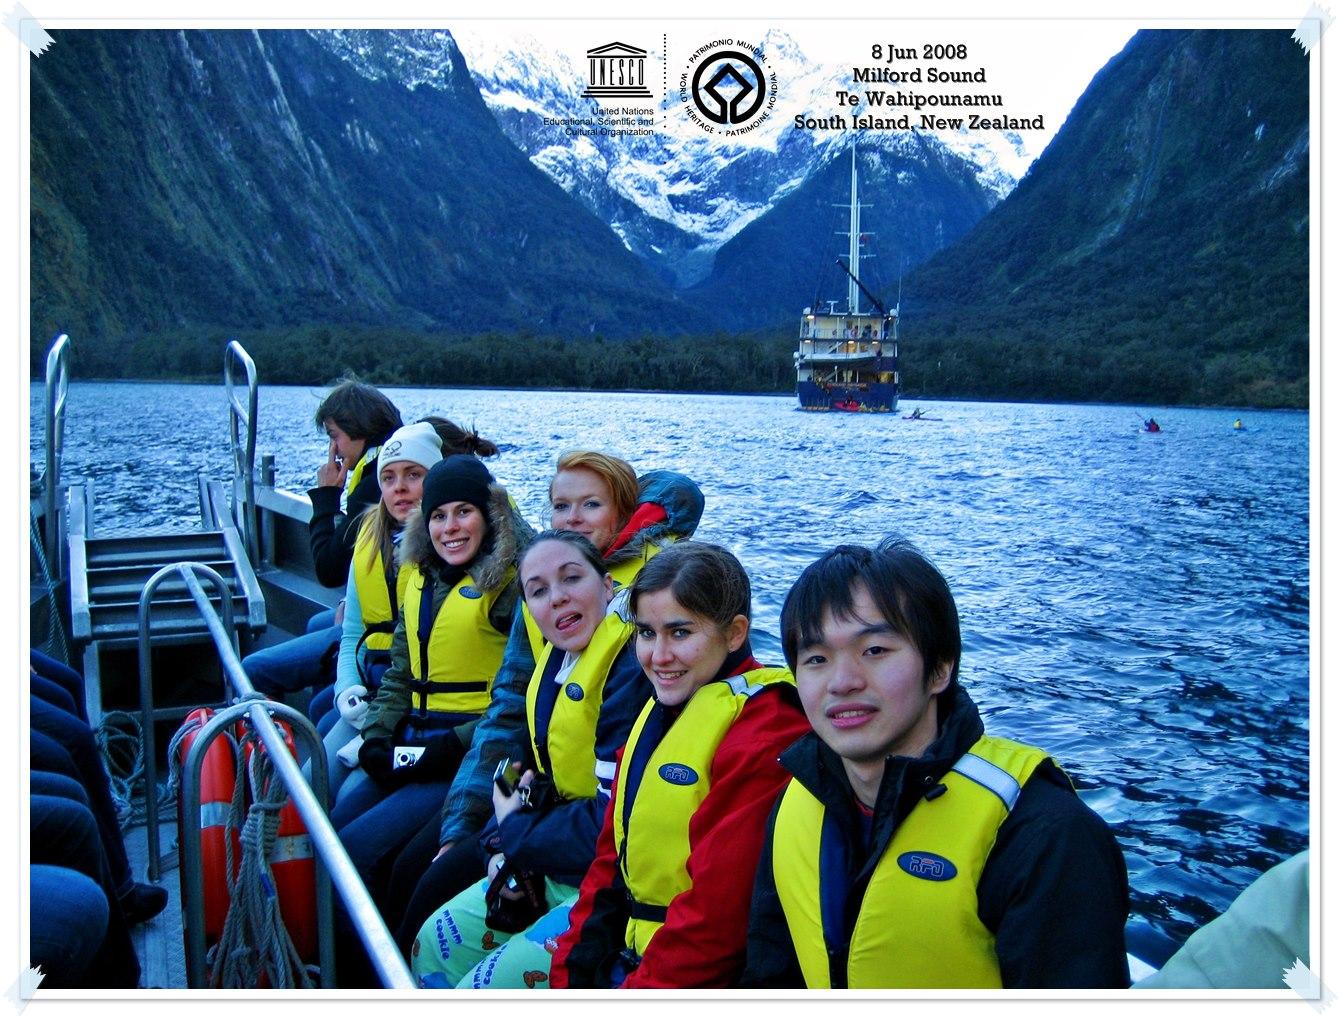 Boating at Milford Sound New Zealand Thomas shaw Te Wahipounamu – South West New Zealand